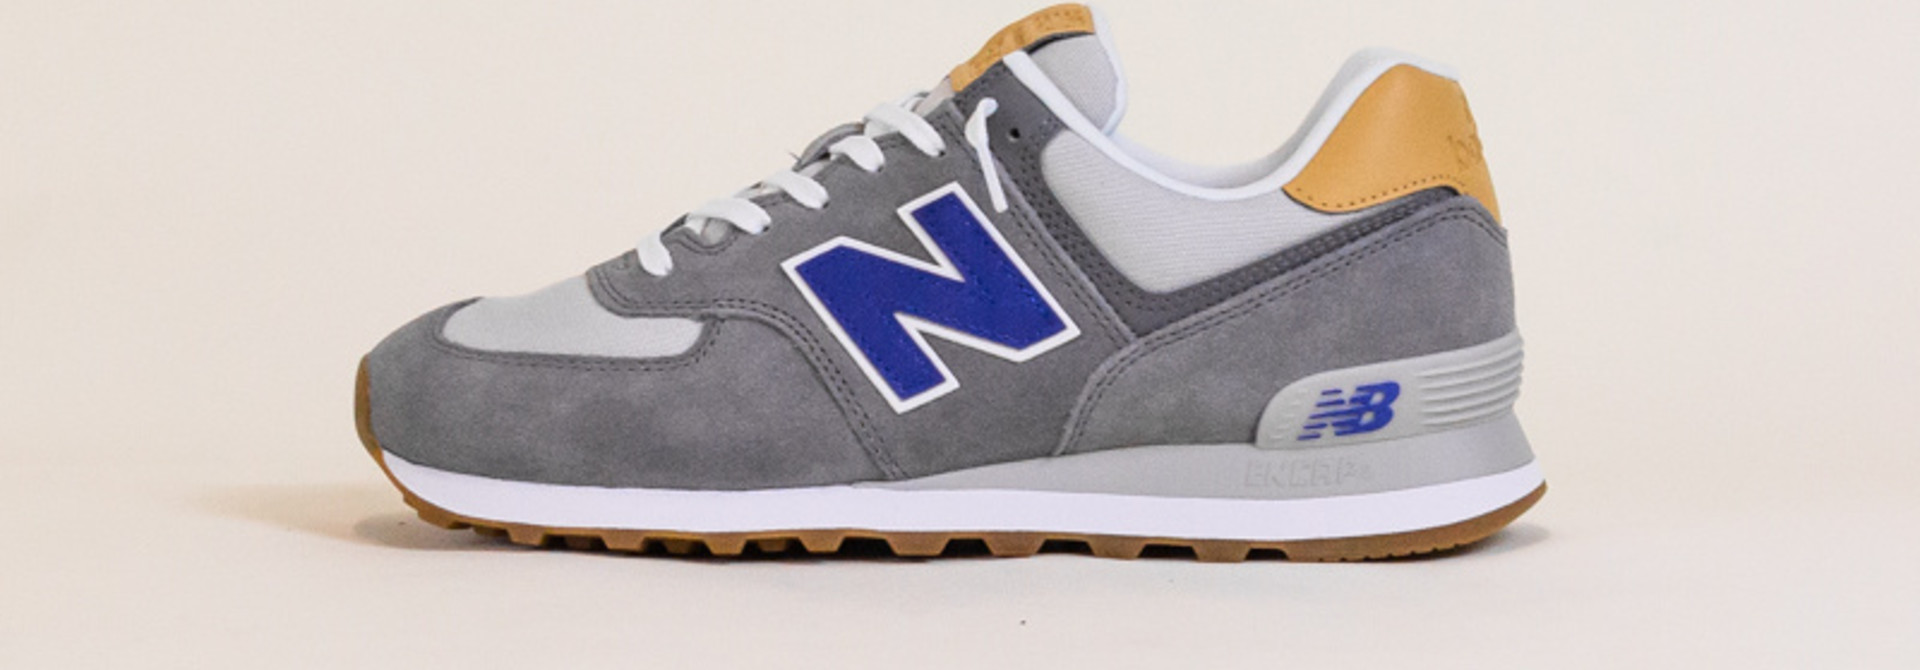 New Balance 574 NE2 - Gray/Blue